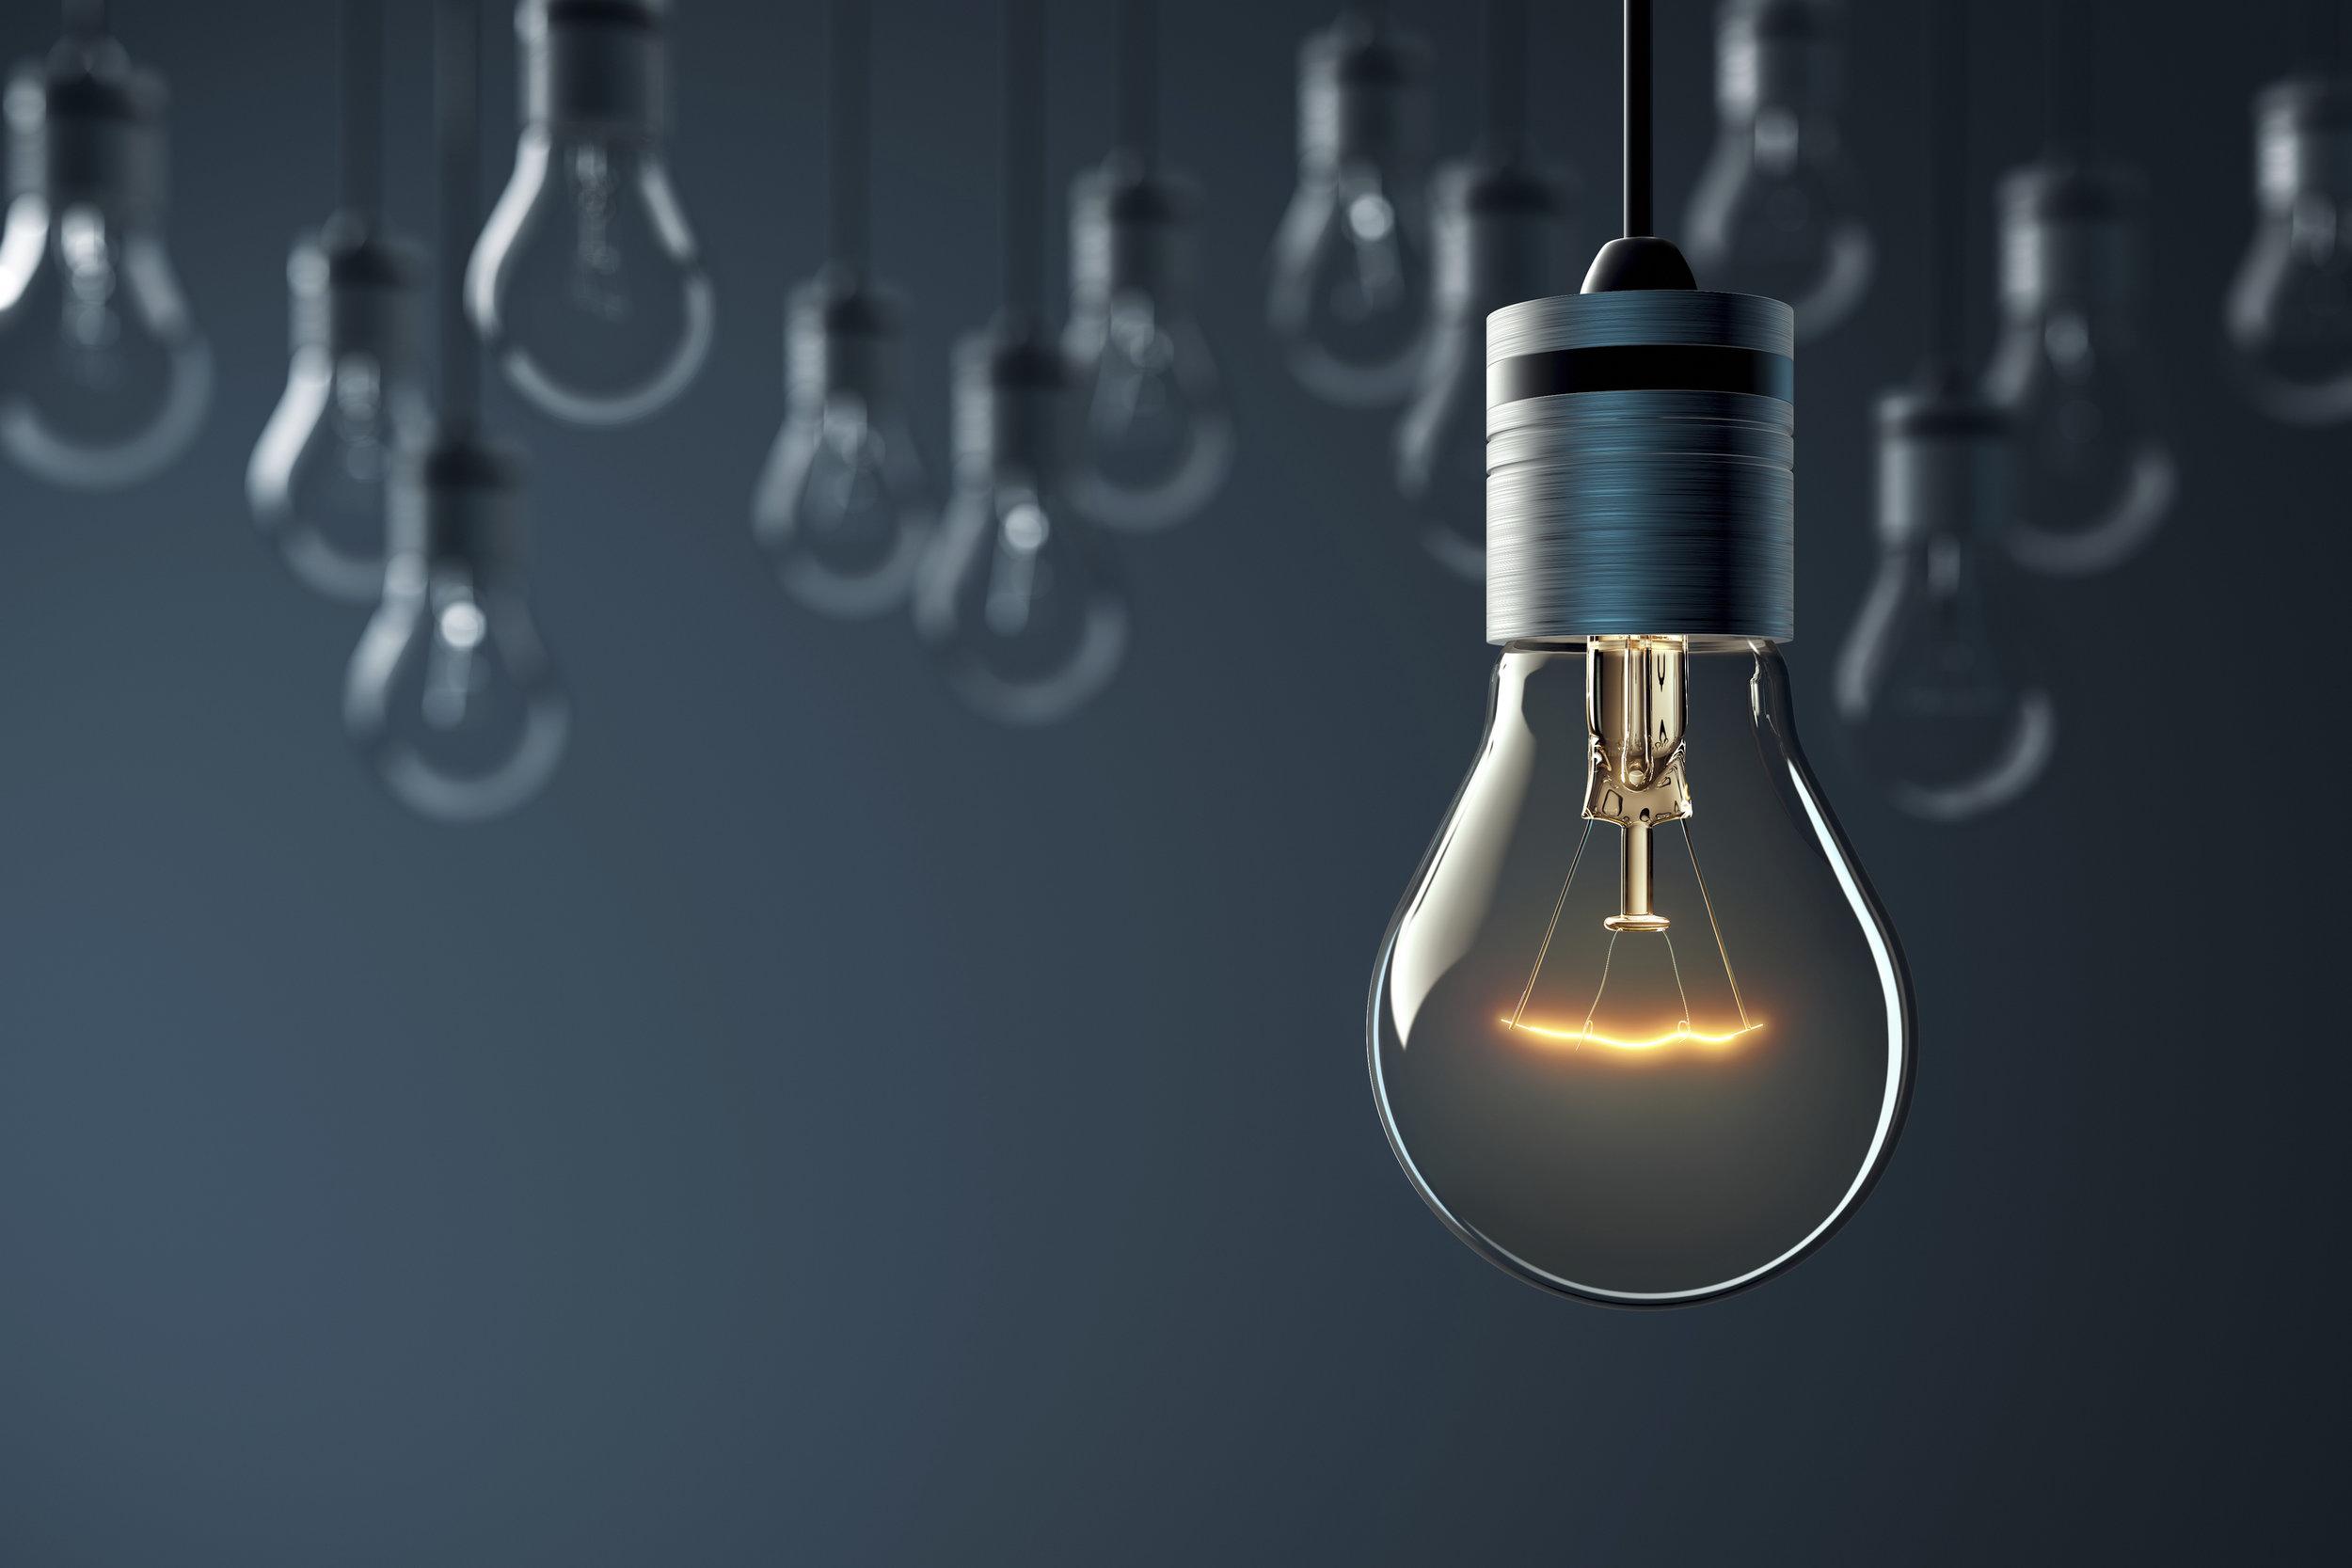 Lightbulbs_LARGE.jpg